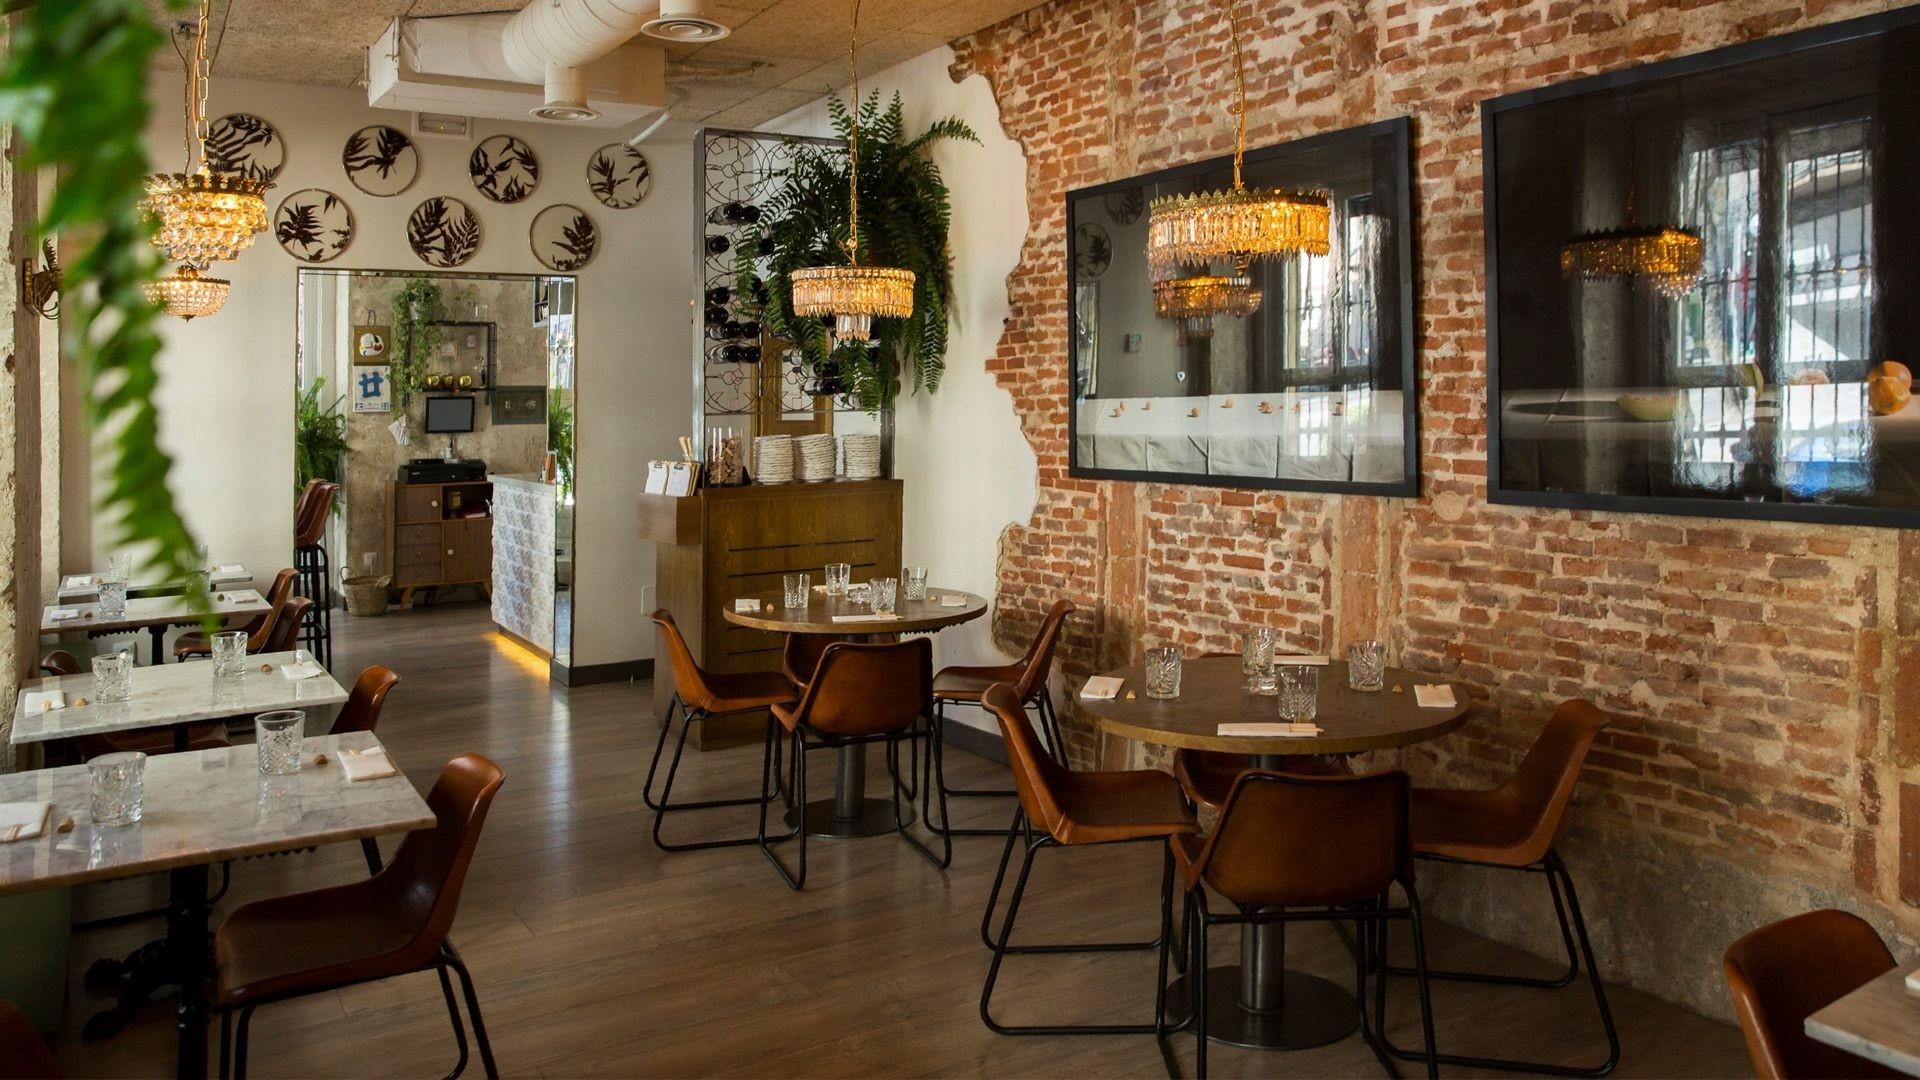 Restaurante fusion cocina asiática en Madrid